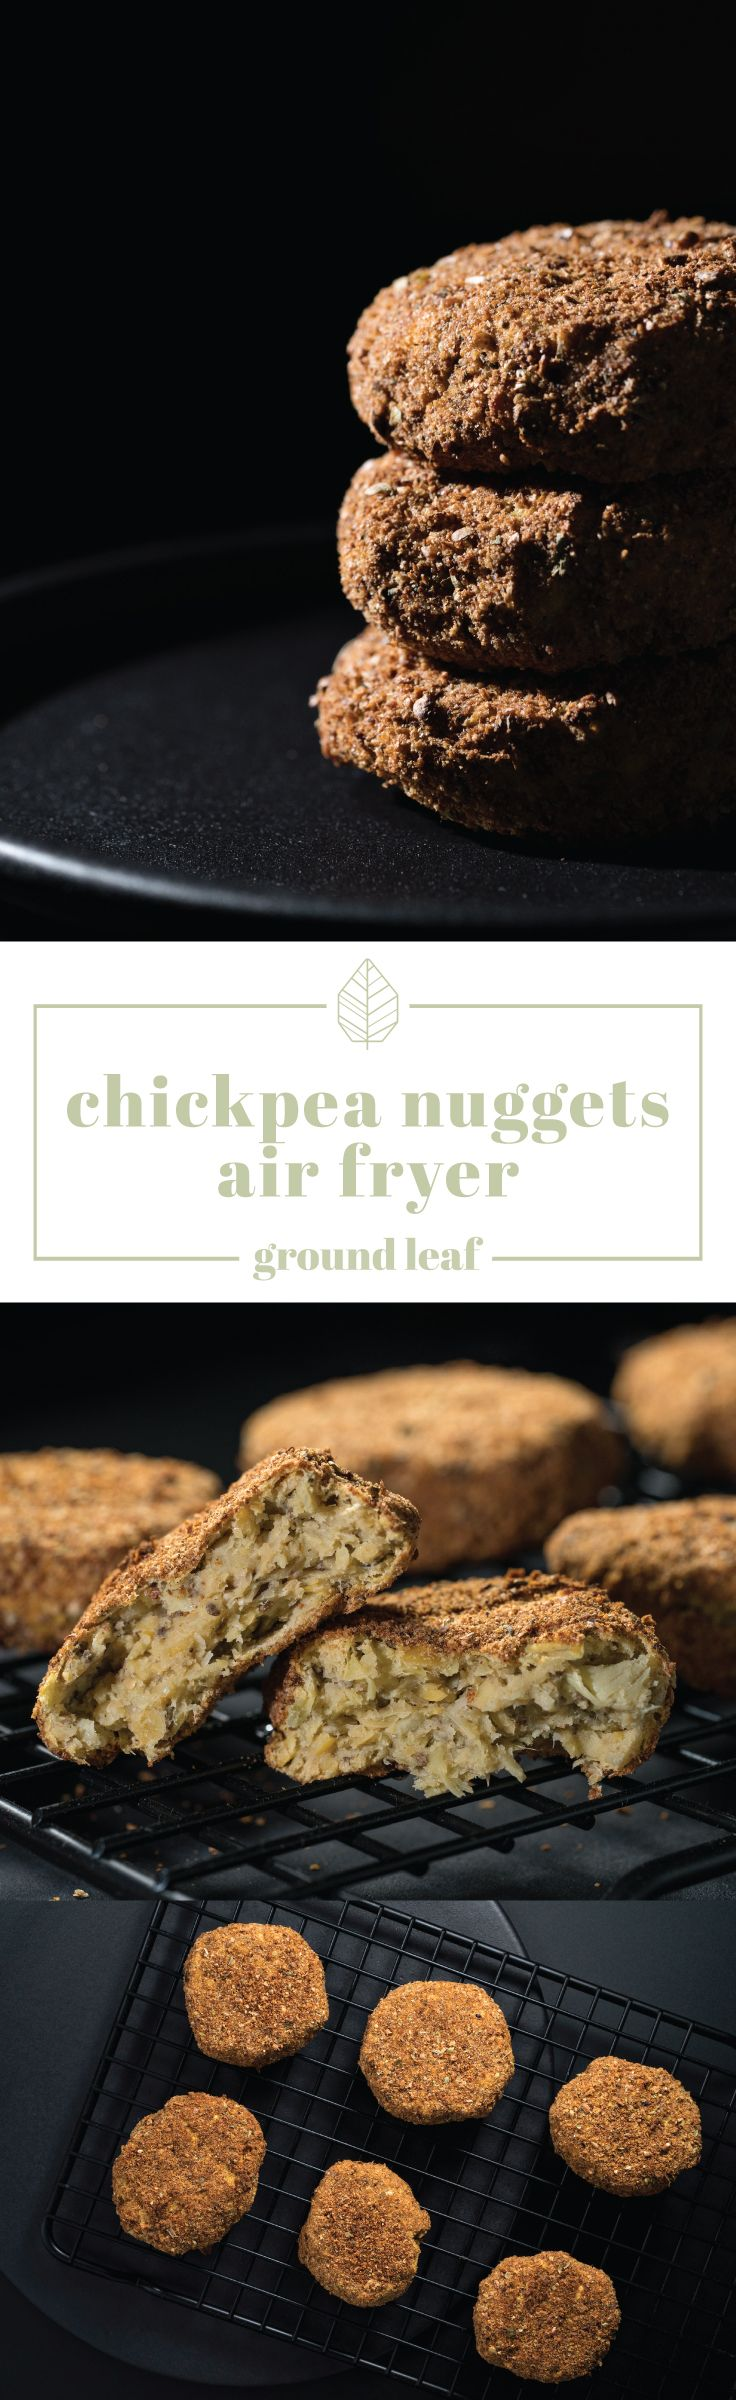 Air fryer chickpea nuggets vegan meat recipe